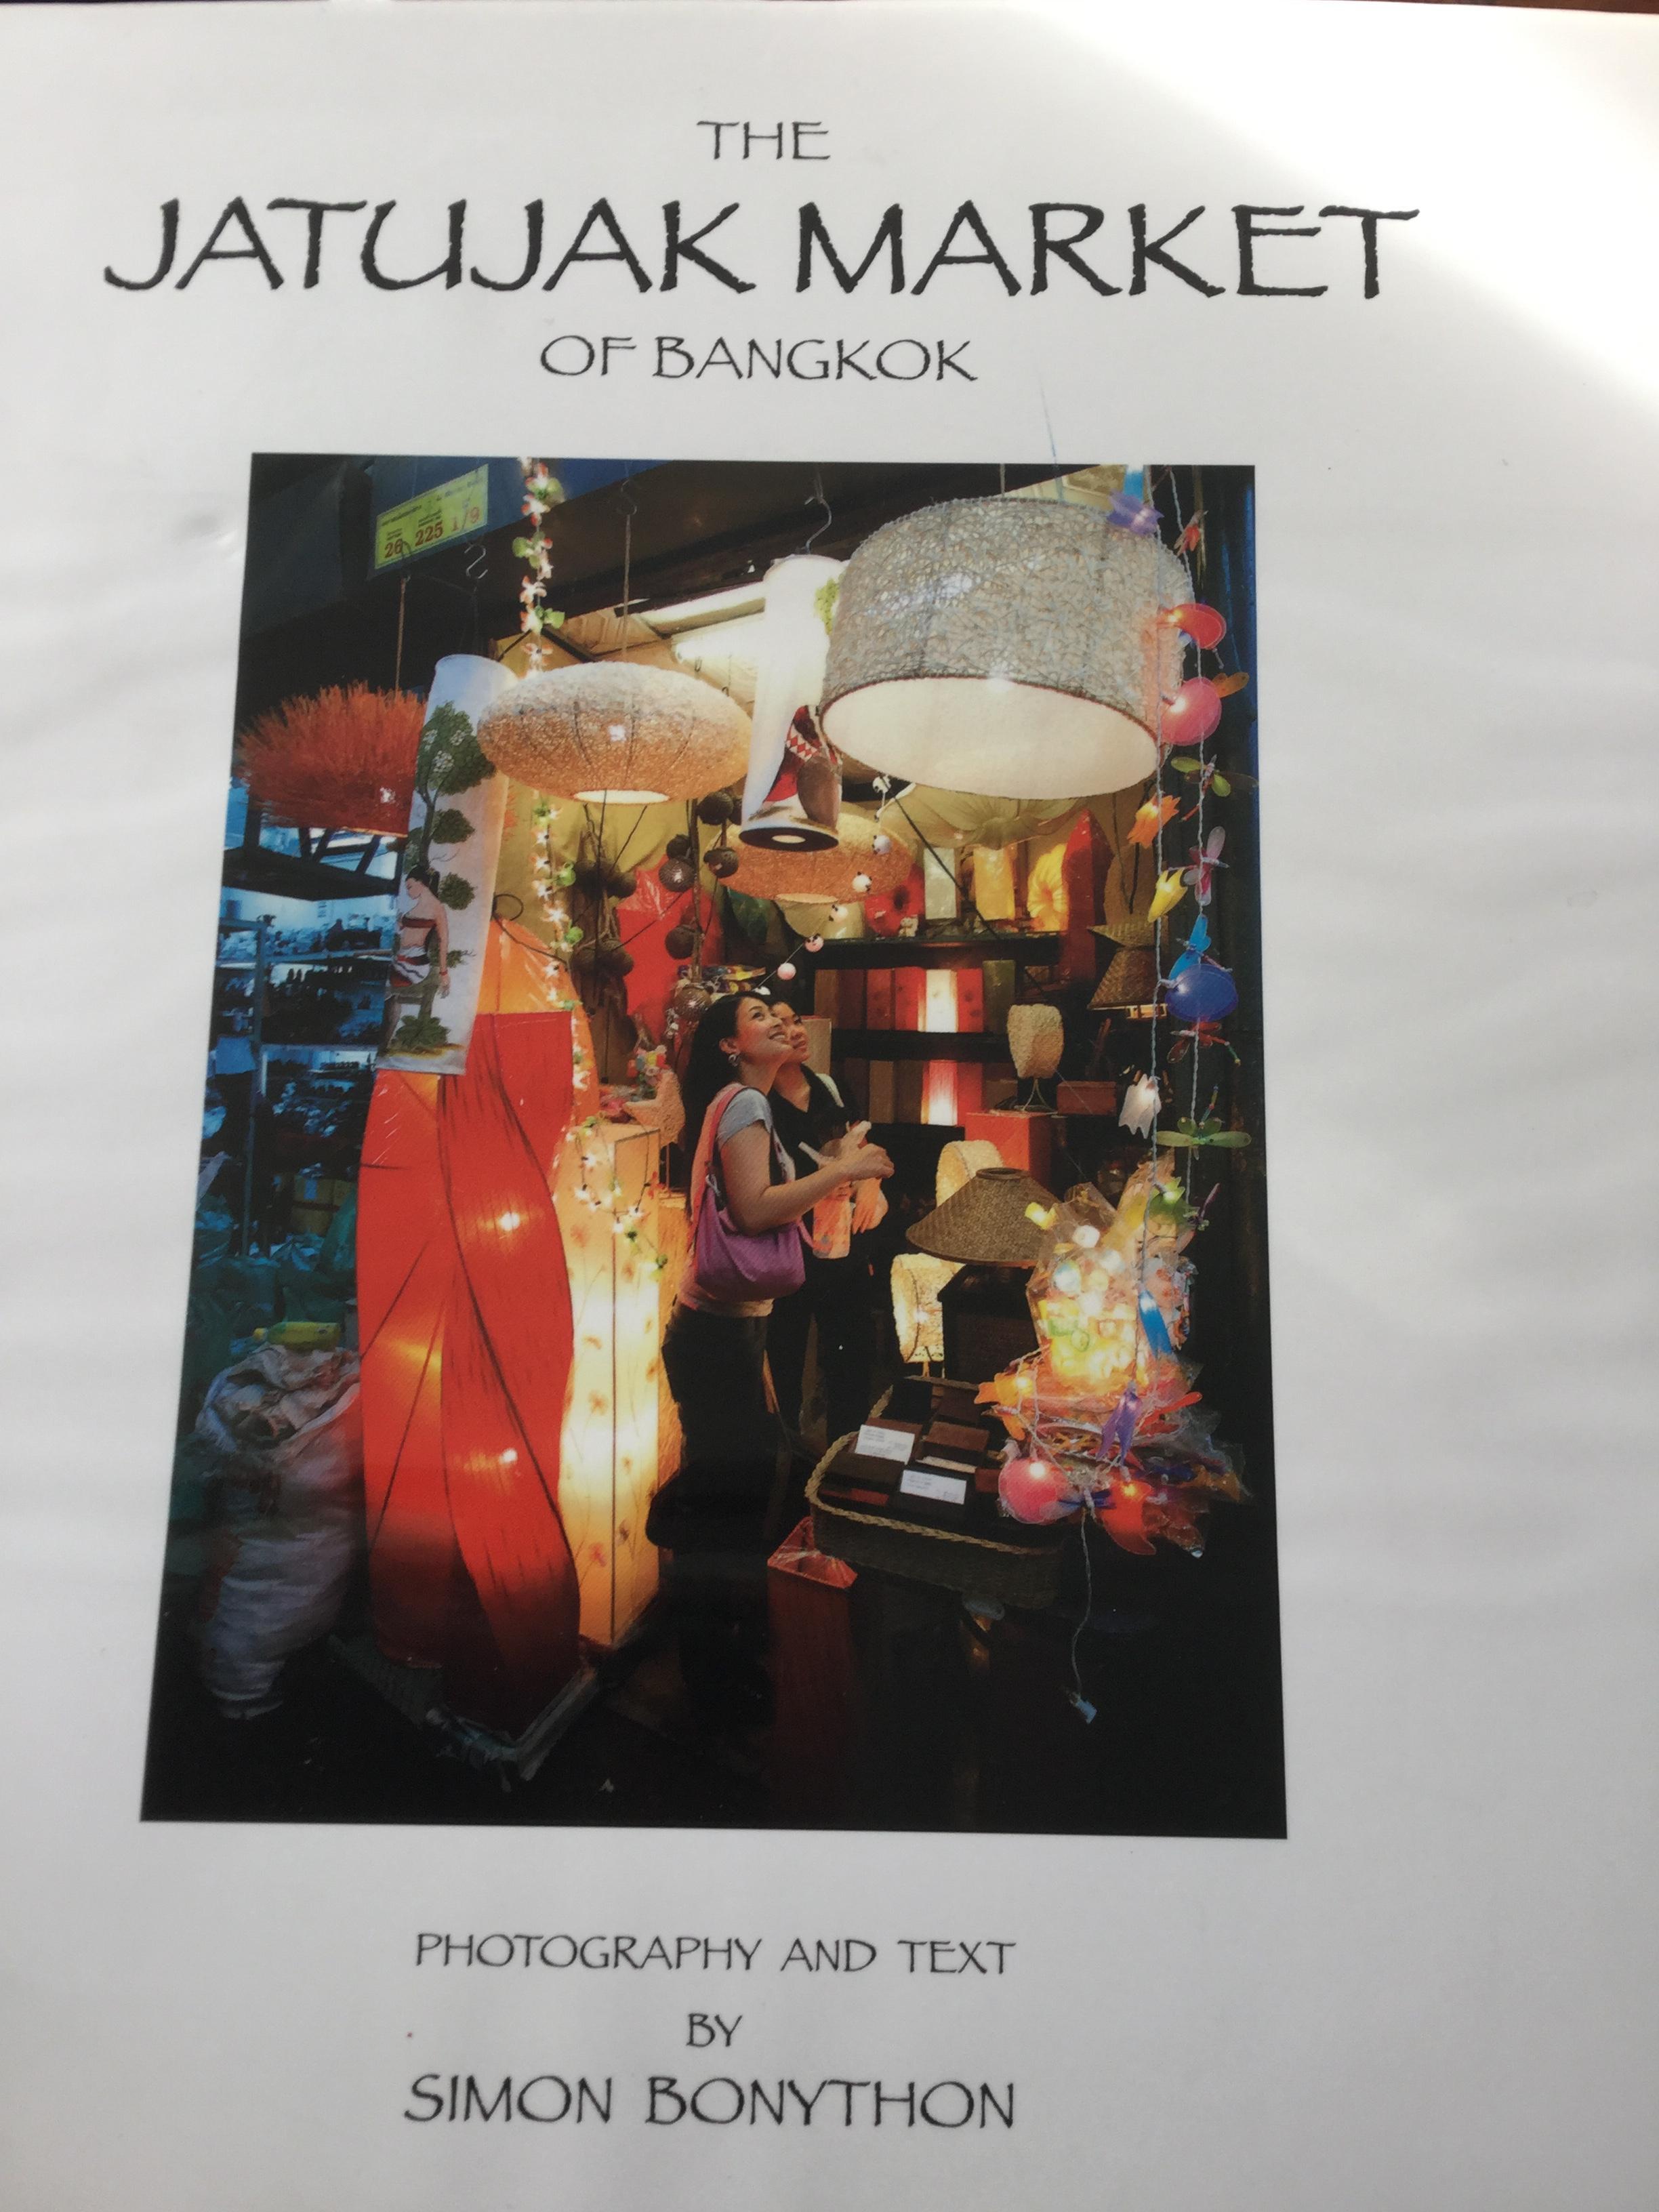 The JATUJAK MARKET of BANGKOK Photography and Text by Slmon Bonython